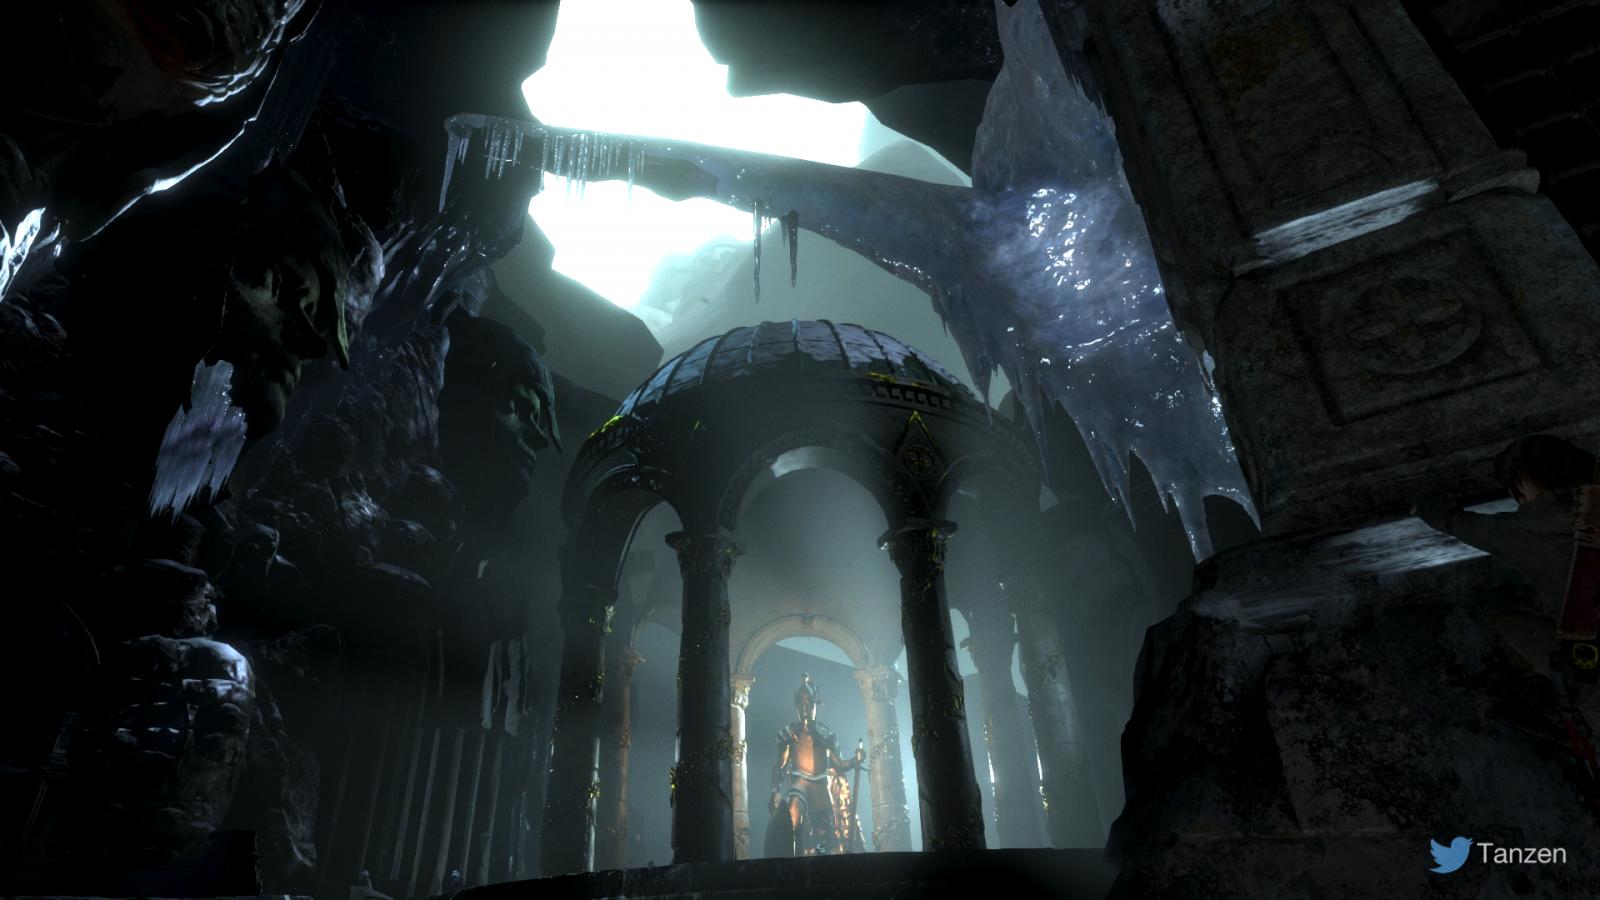 Rise of the Tomb Raider Screen Shot 09.11.15 20. 5_watermark